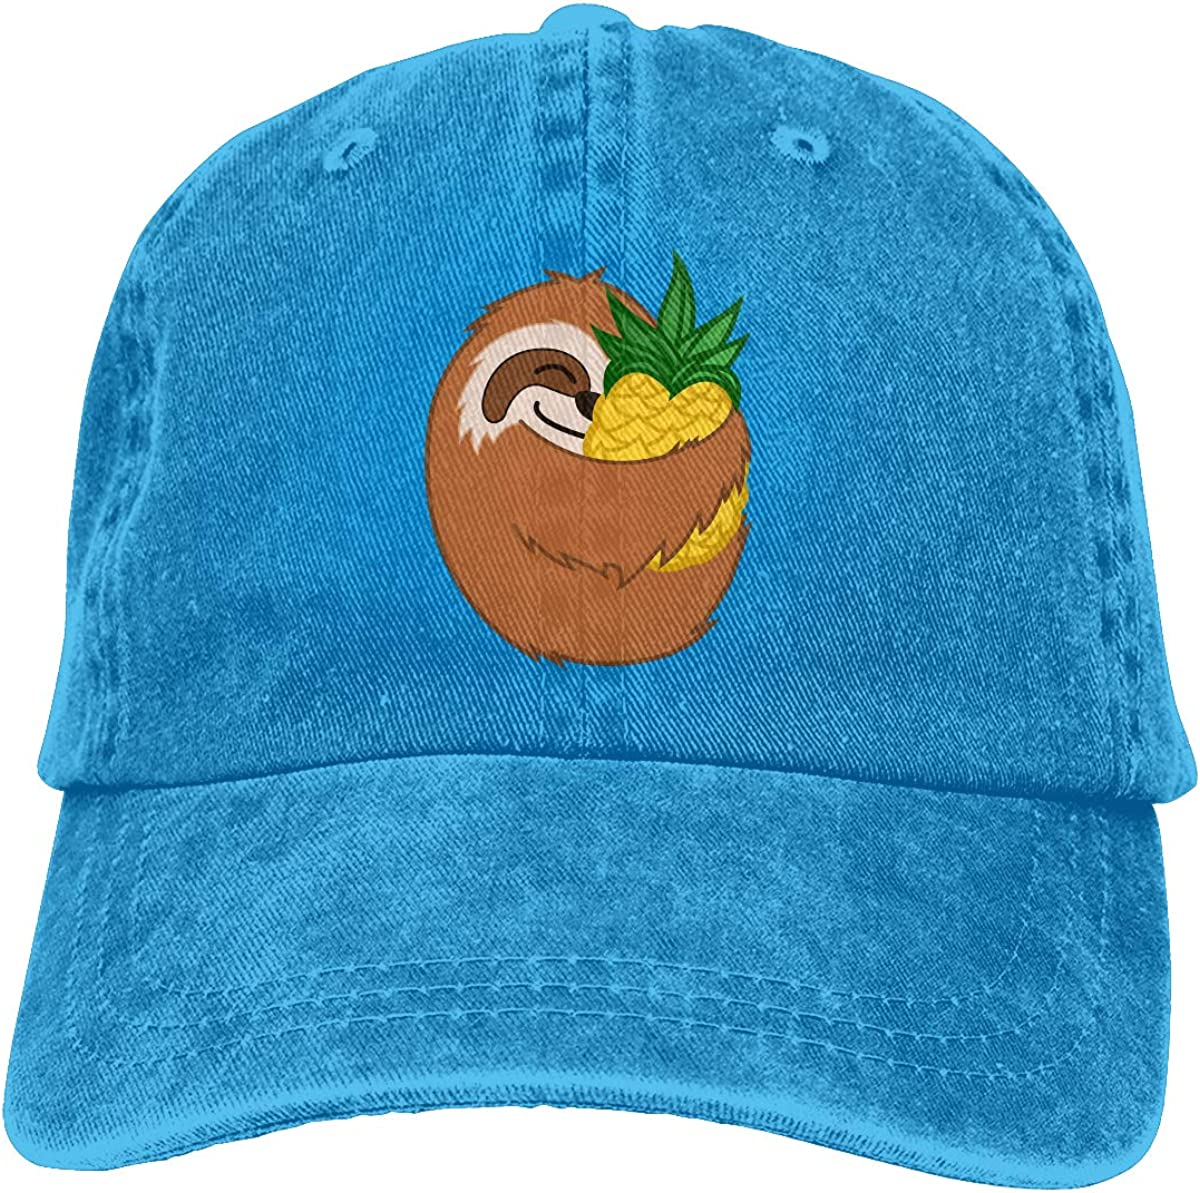 Sloth Hug Pineapple Unisex Baseball Cap Cotton Denim Fantastic Adjustable Sun Hat for Men Women Youth